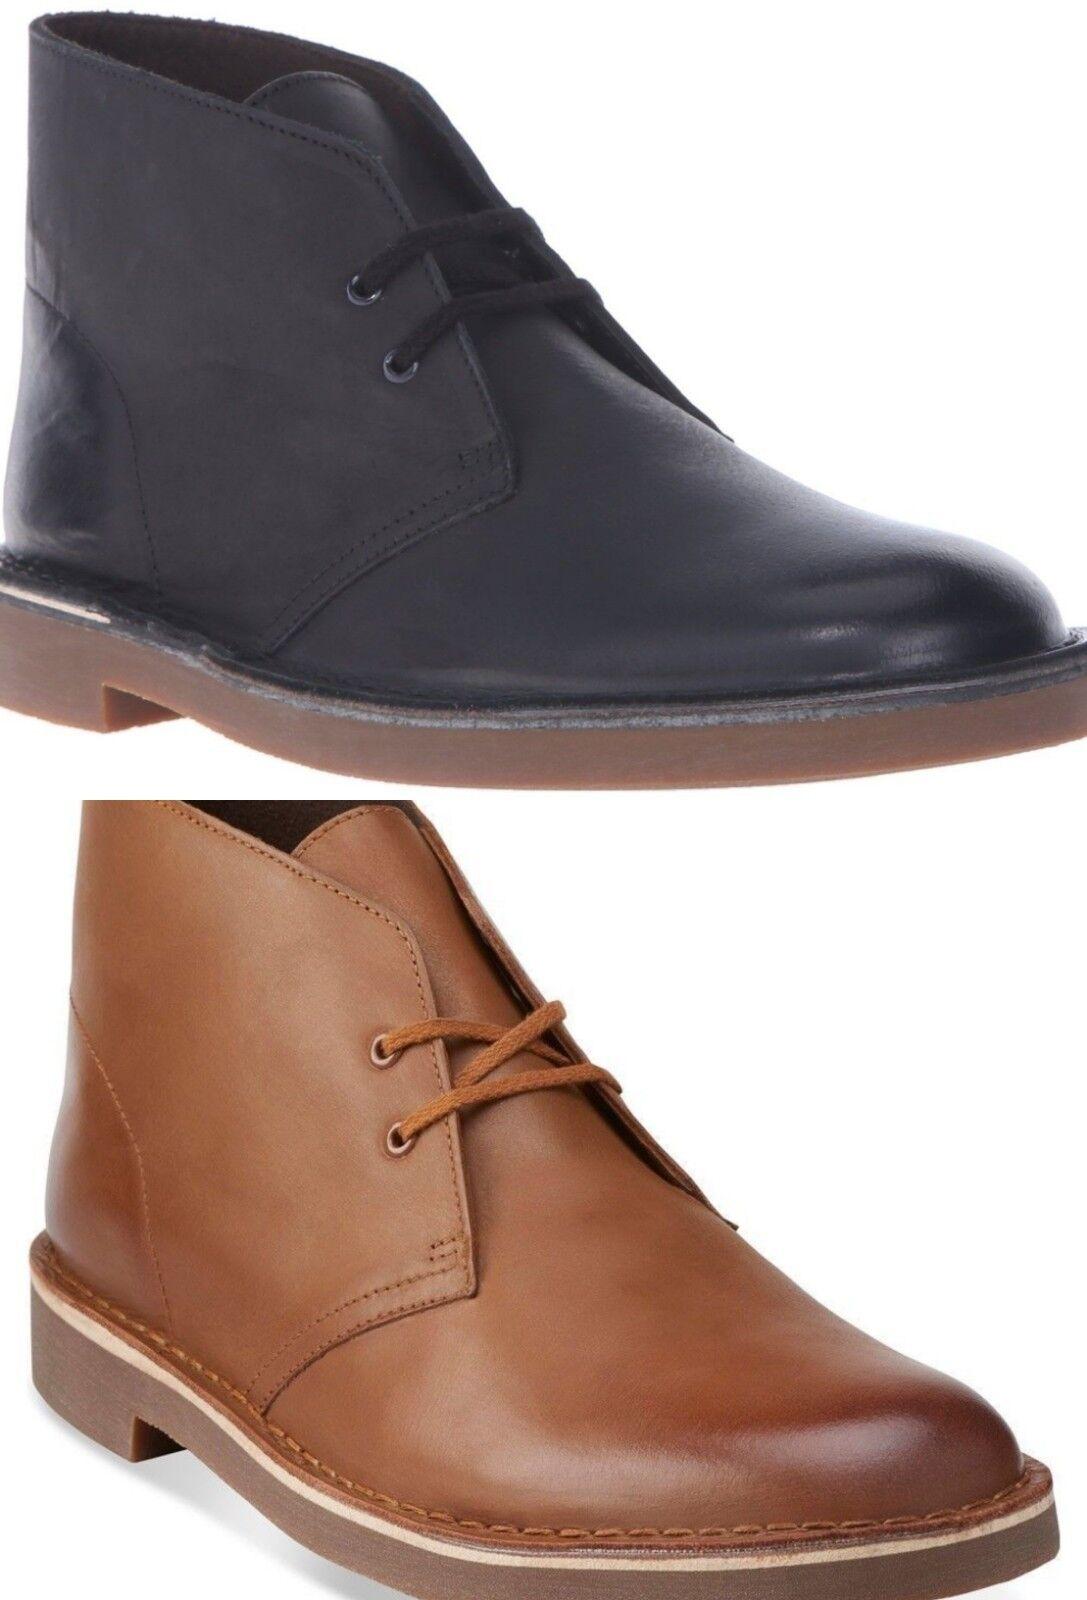 Clarks Bushacre 2 Men's Leather Desert Chukka Boots Medium Dress Boots